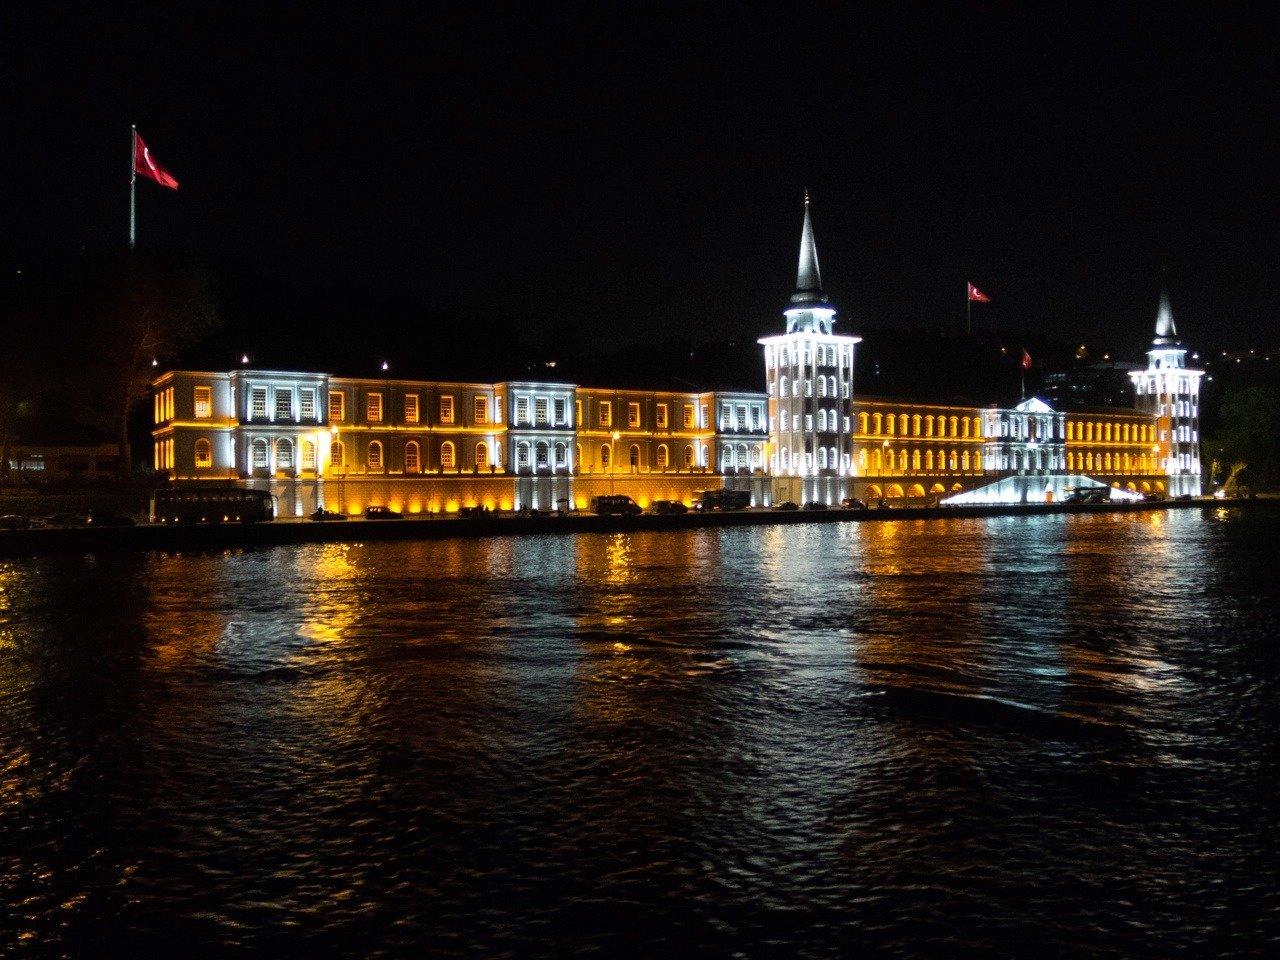 A military school on the Bosphorus.